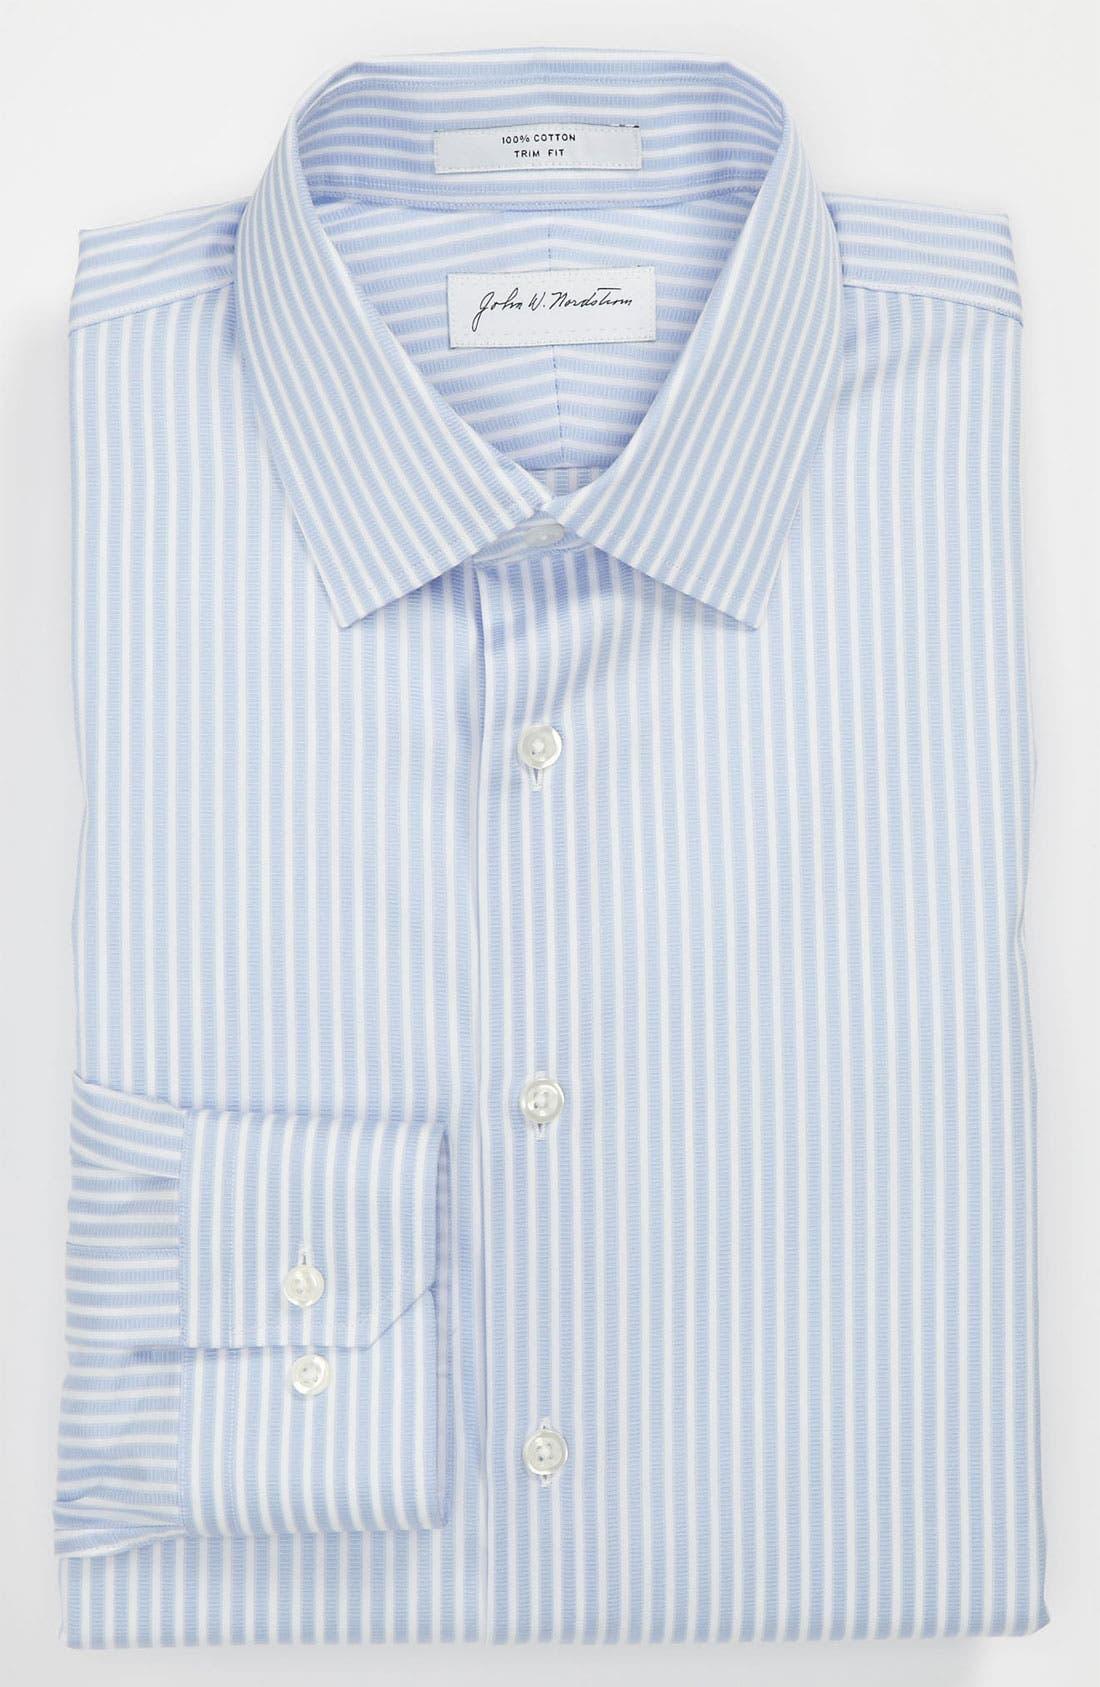 Main Image - John W. Nordstrom Trim Fit Dress Shirt